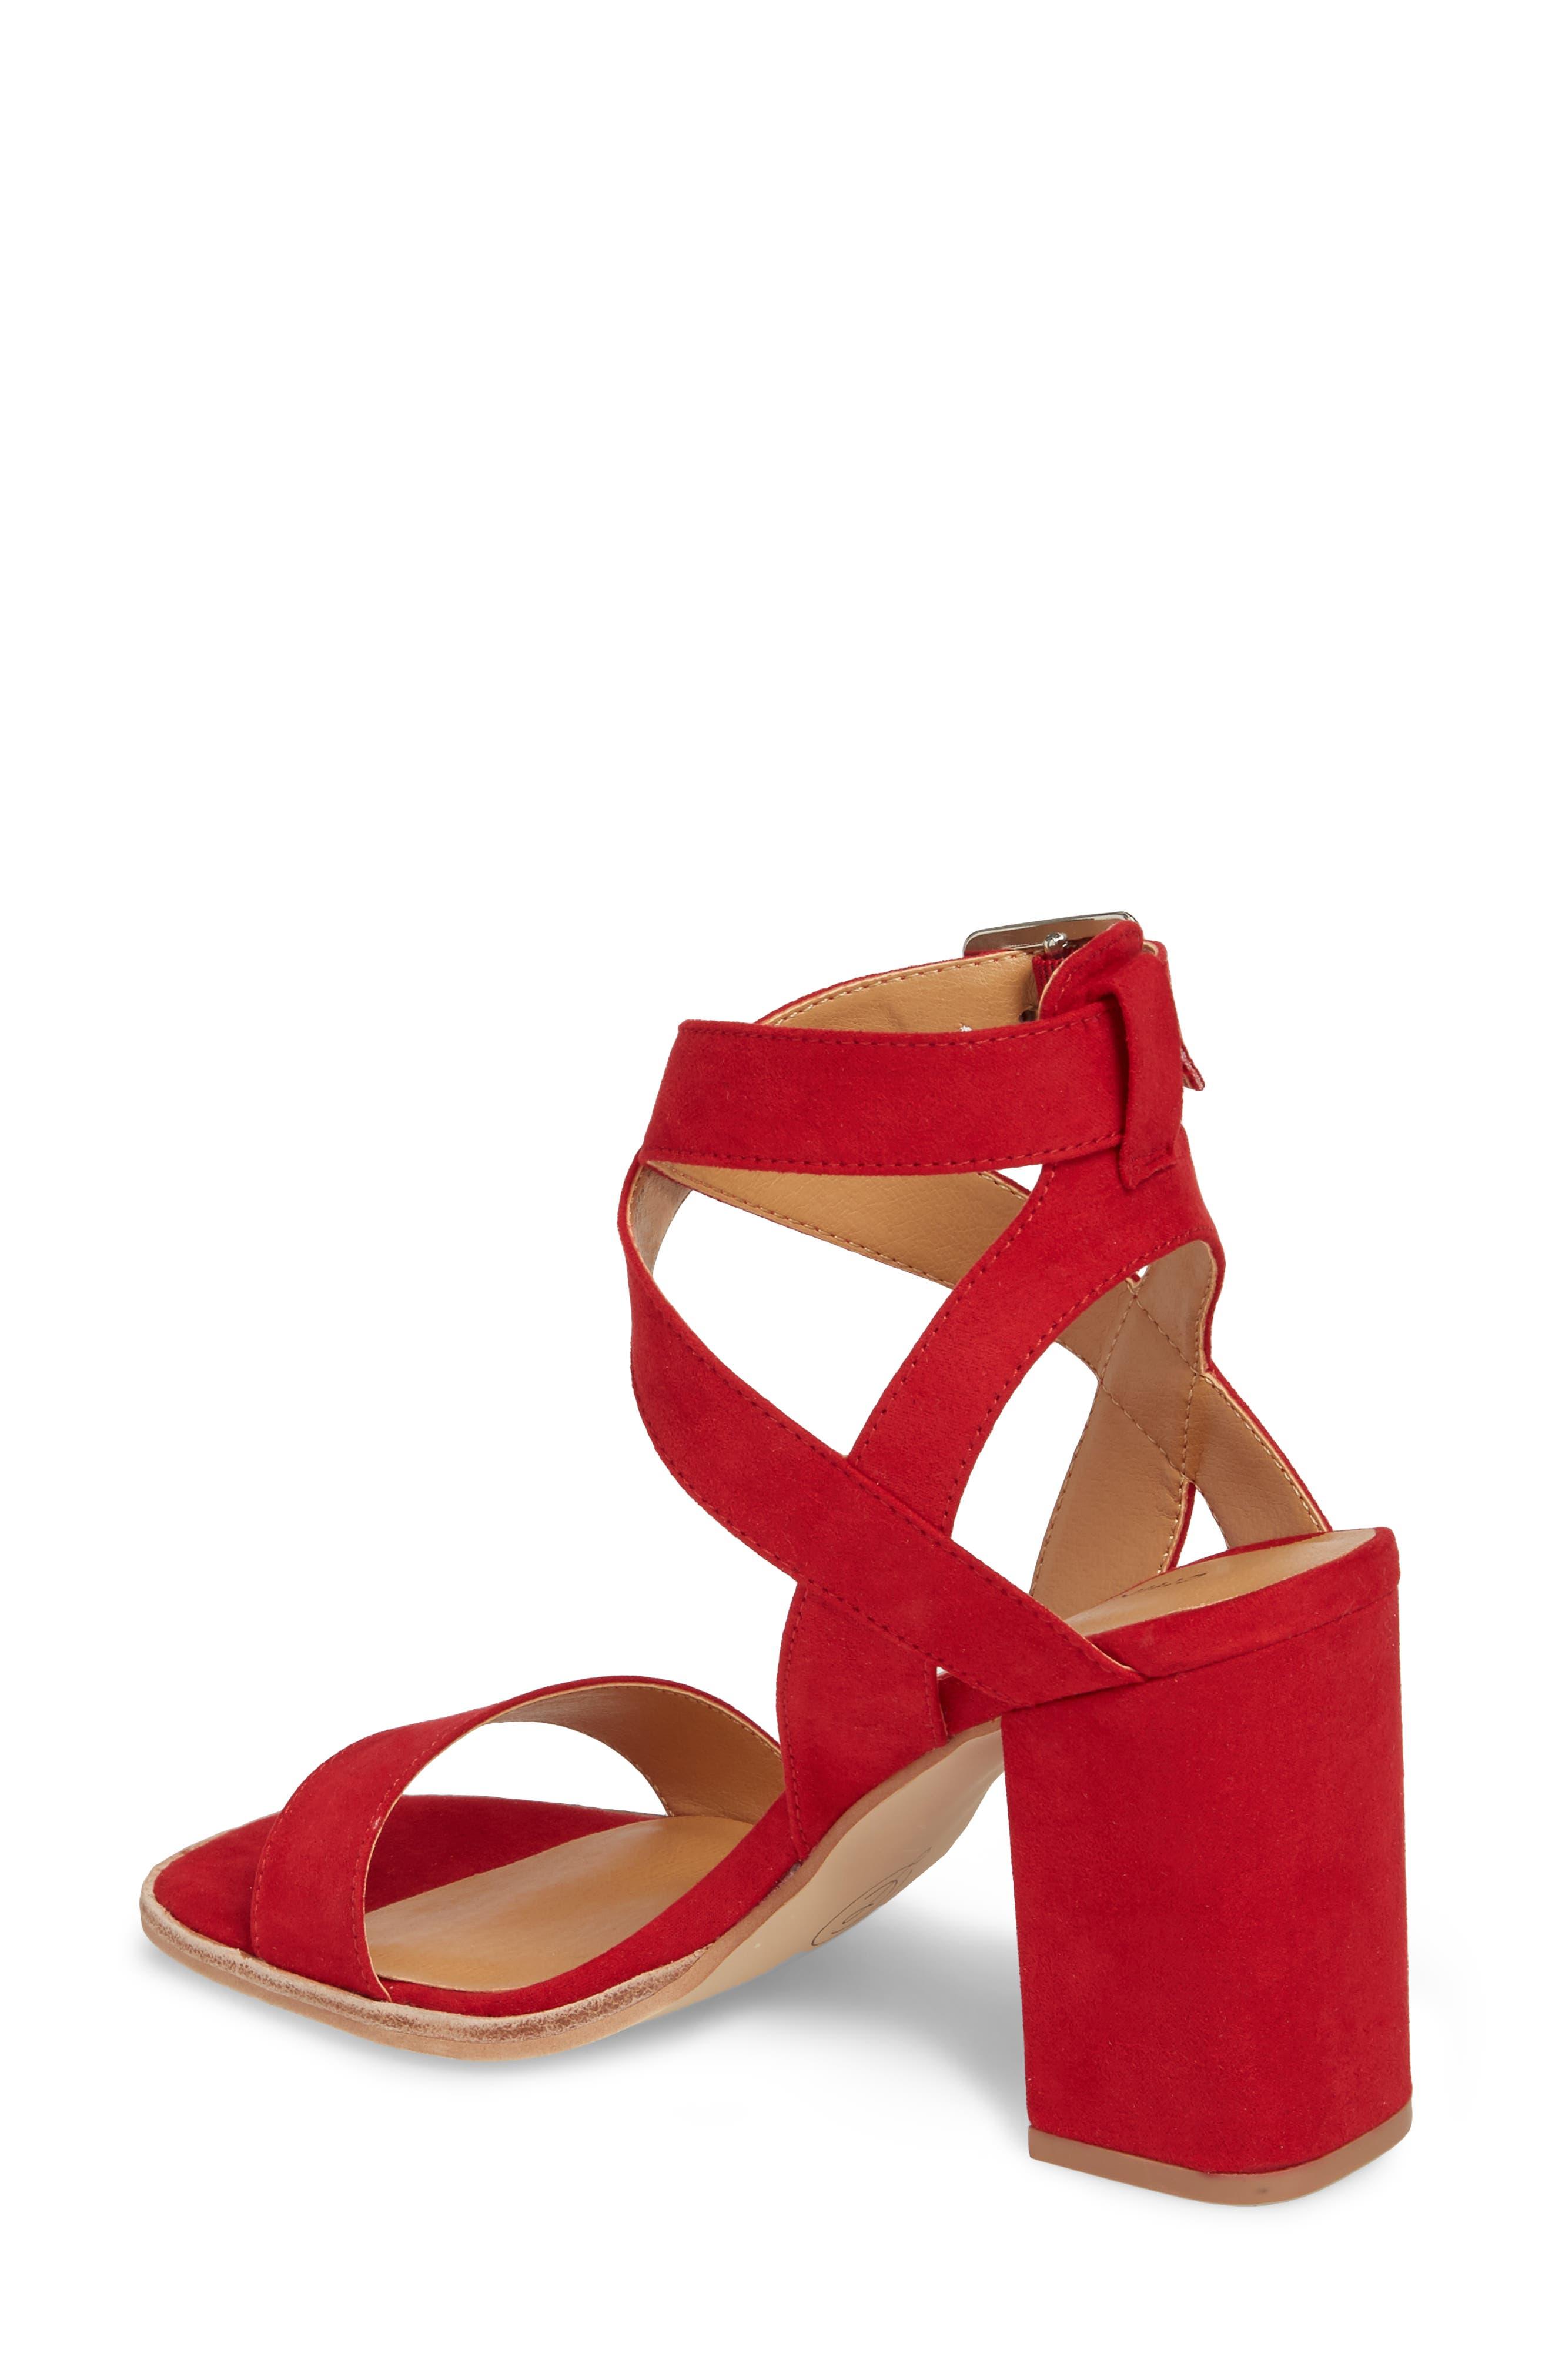 Stassi Block Heel Sandal,                             Alternate thumbnail 2, color,                             Red